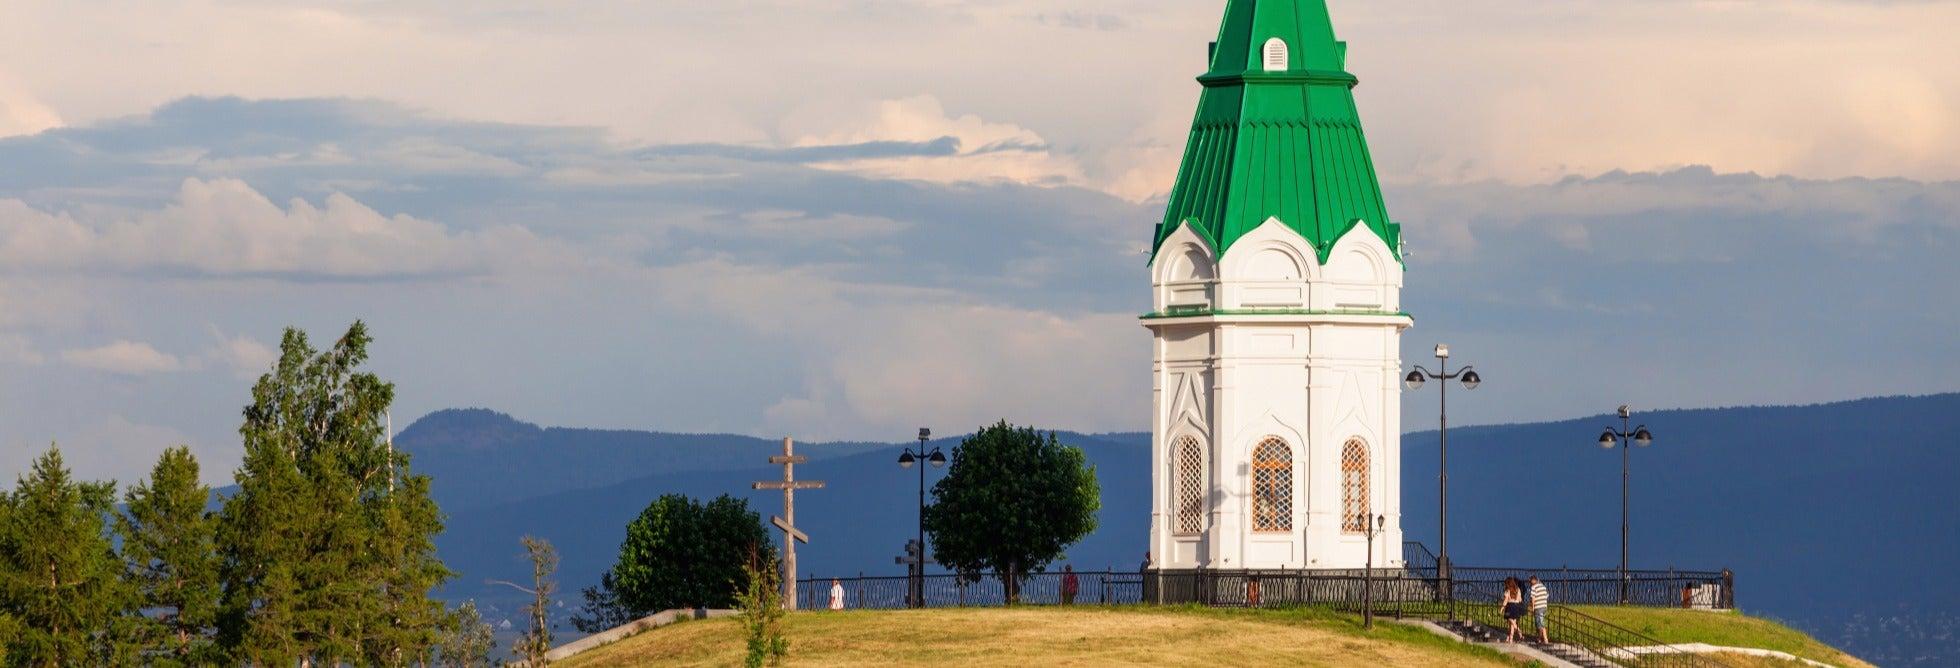 Visita guiada privada por Krasnoyarsk